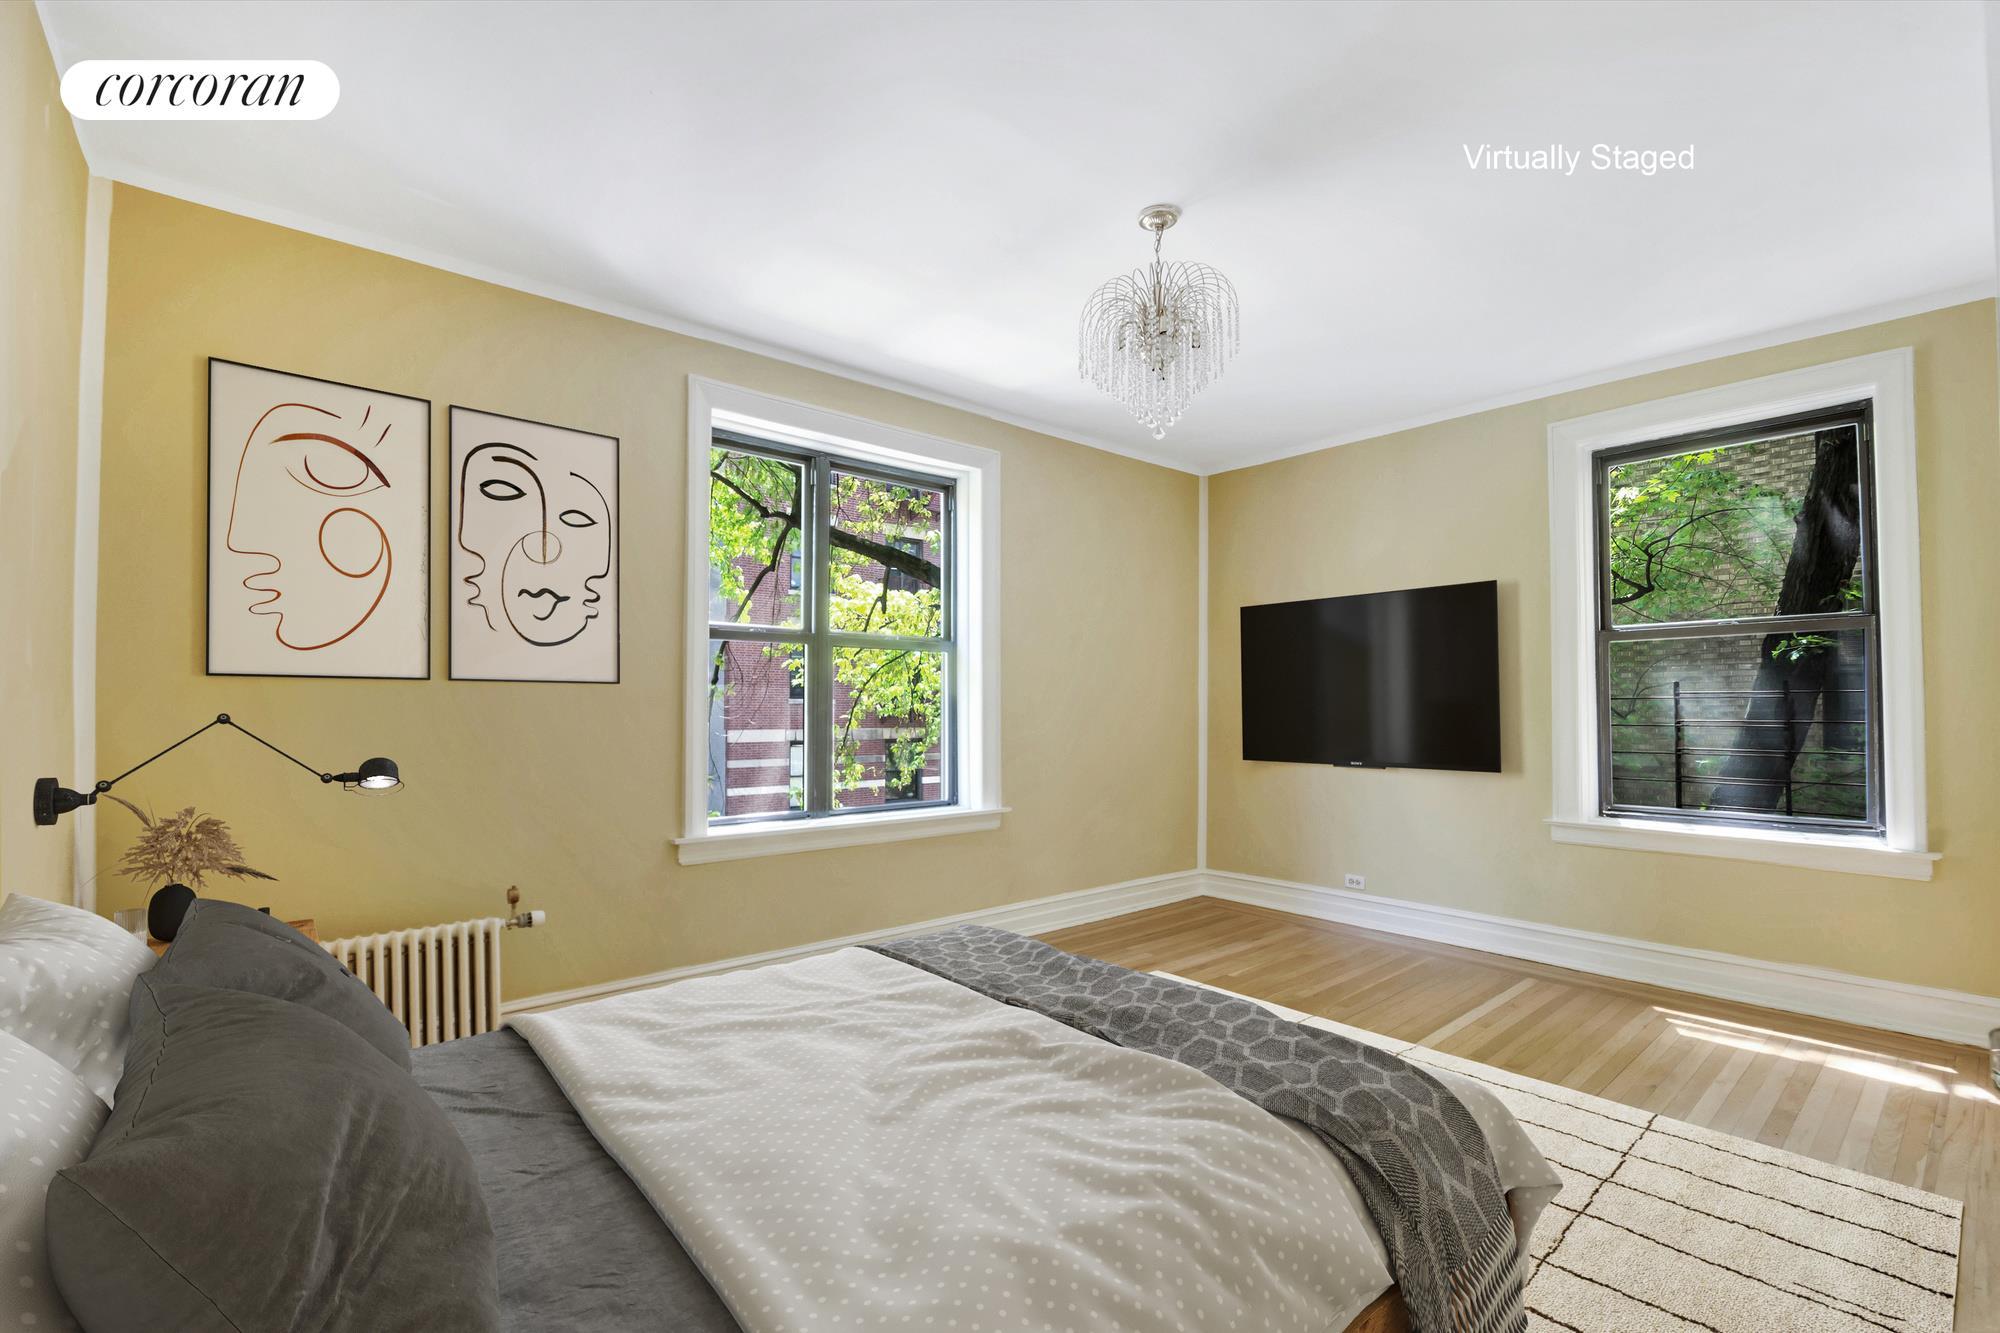 860 West 181st Street Washington Heights New York NY 10033